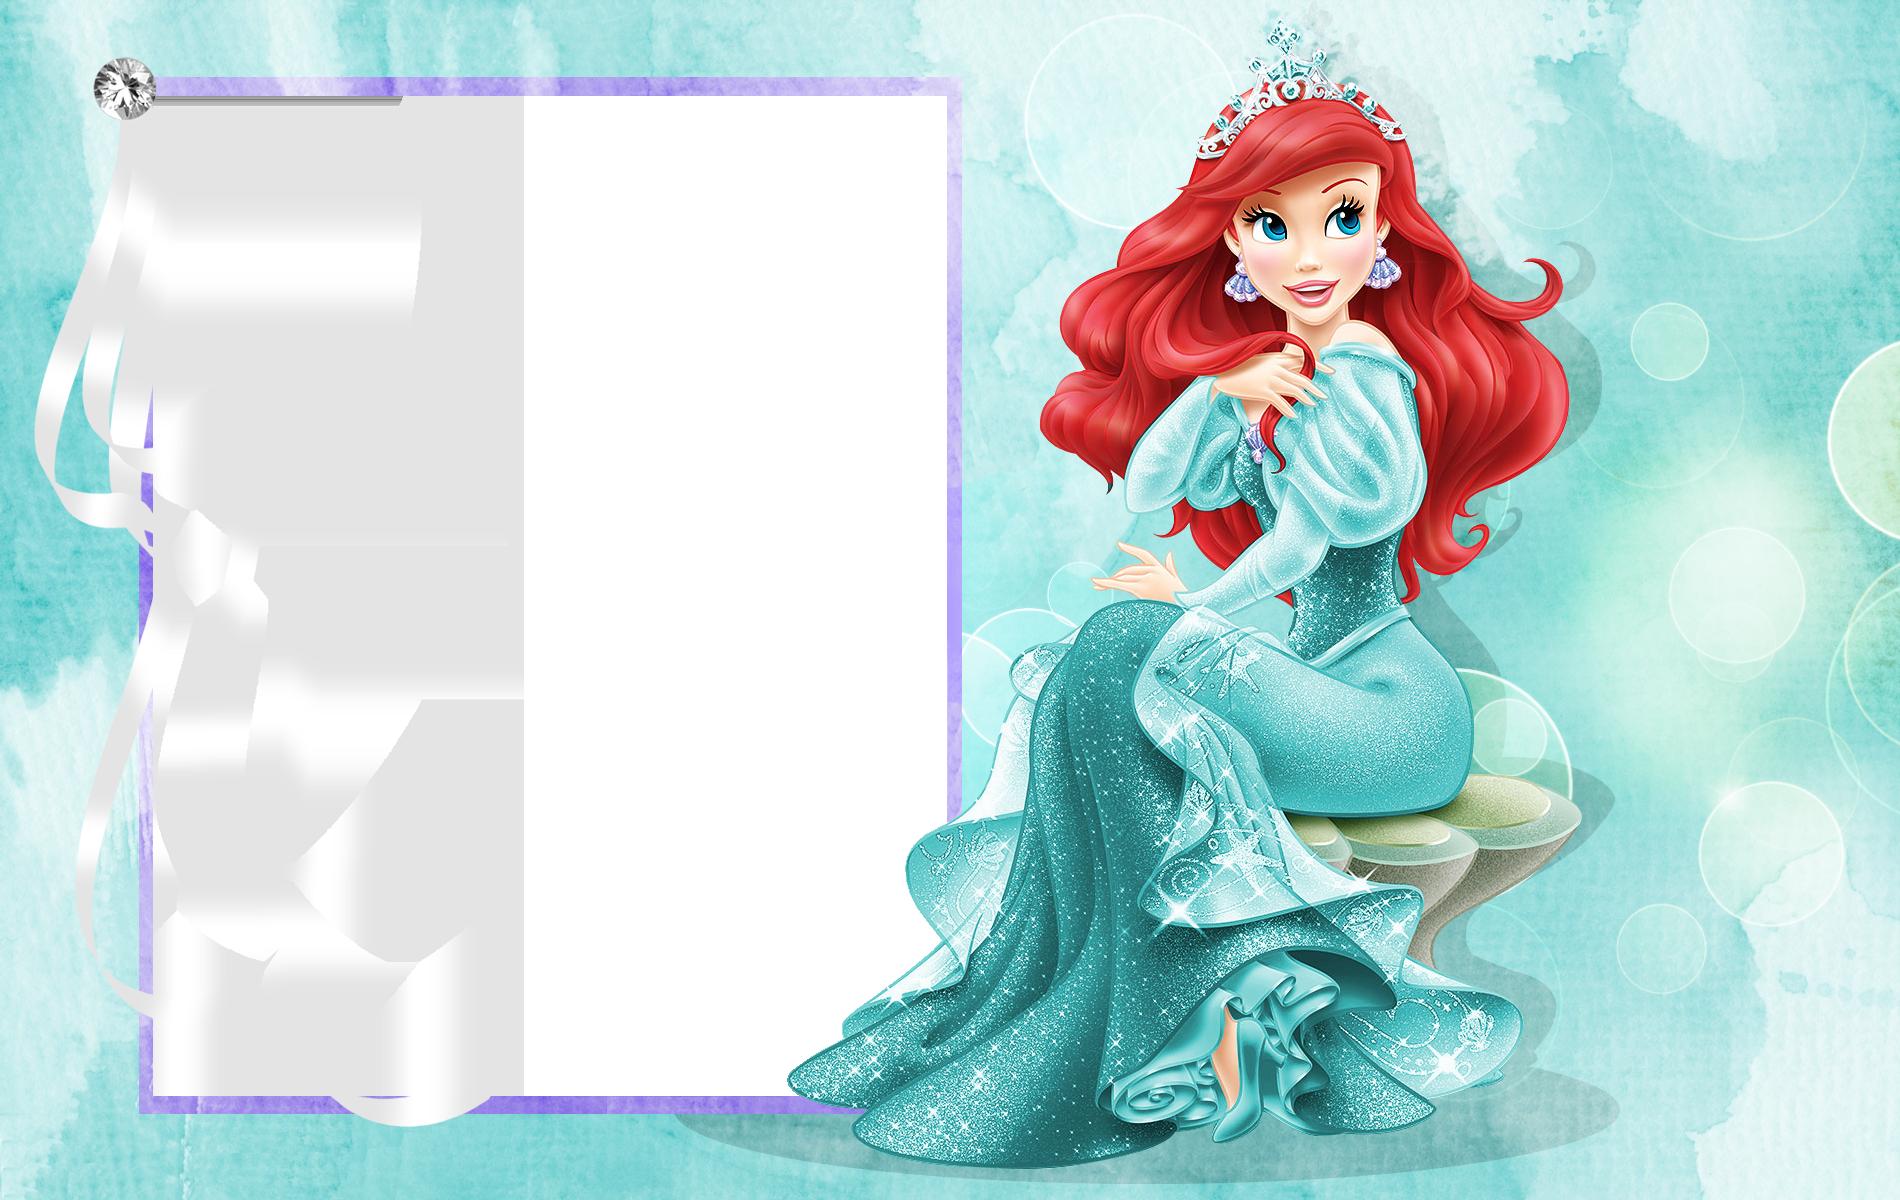 Ariel clipart frame. Princess png transparent gallery